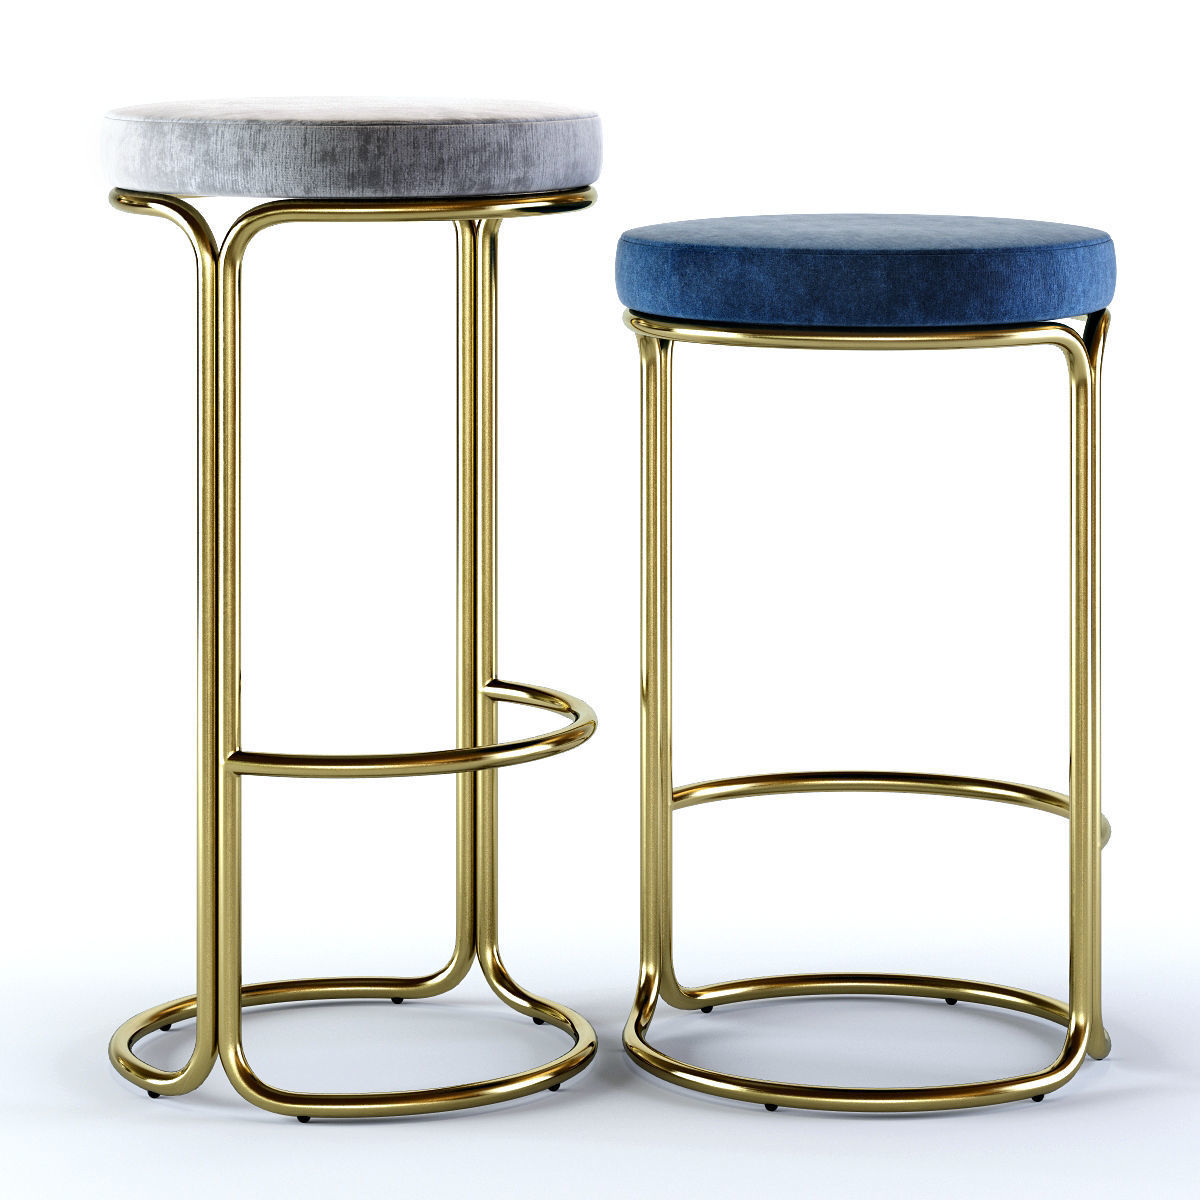 Awe Inspiring West Elm Cora Bar And Counter Stools 3D Model Ibusinesslaw Wood Chair Design Ideas Ibusinesslaworg